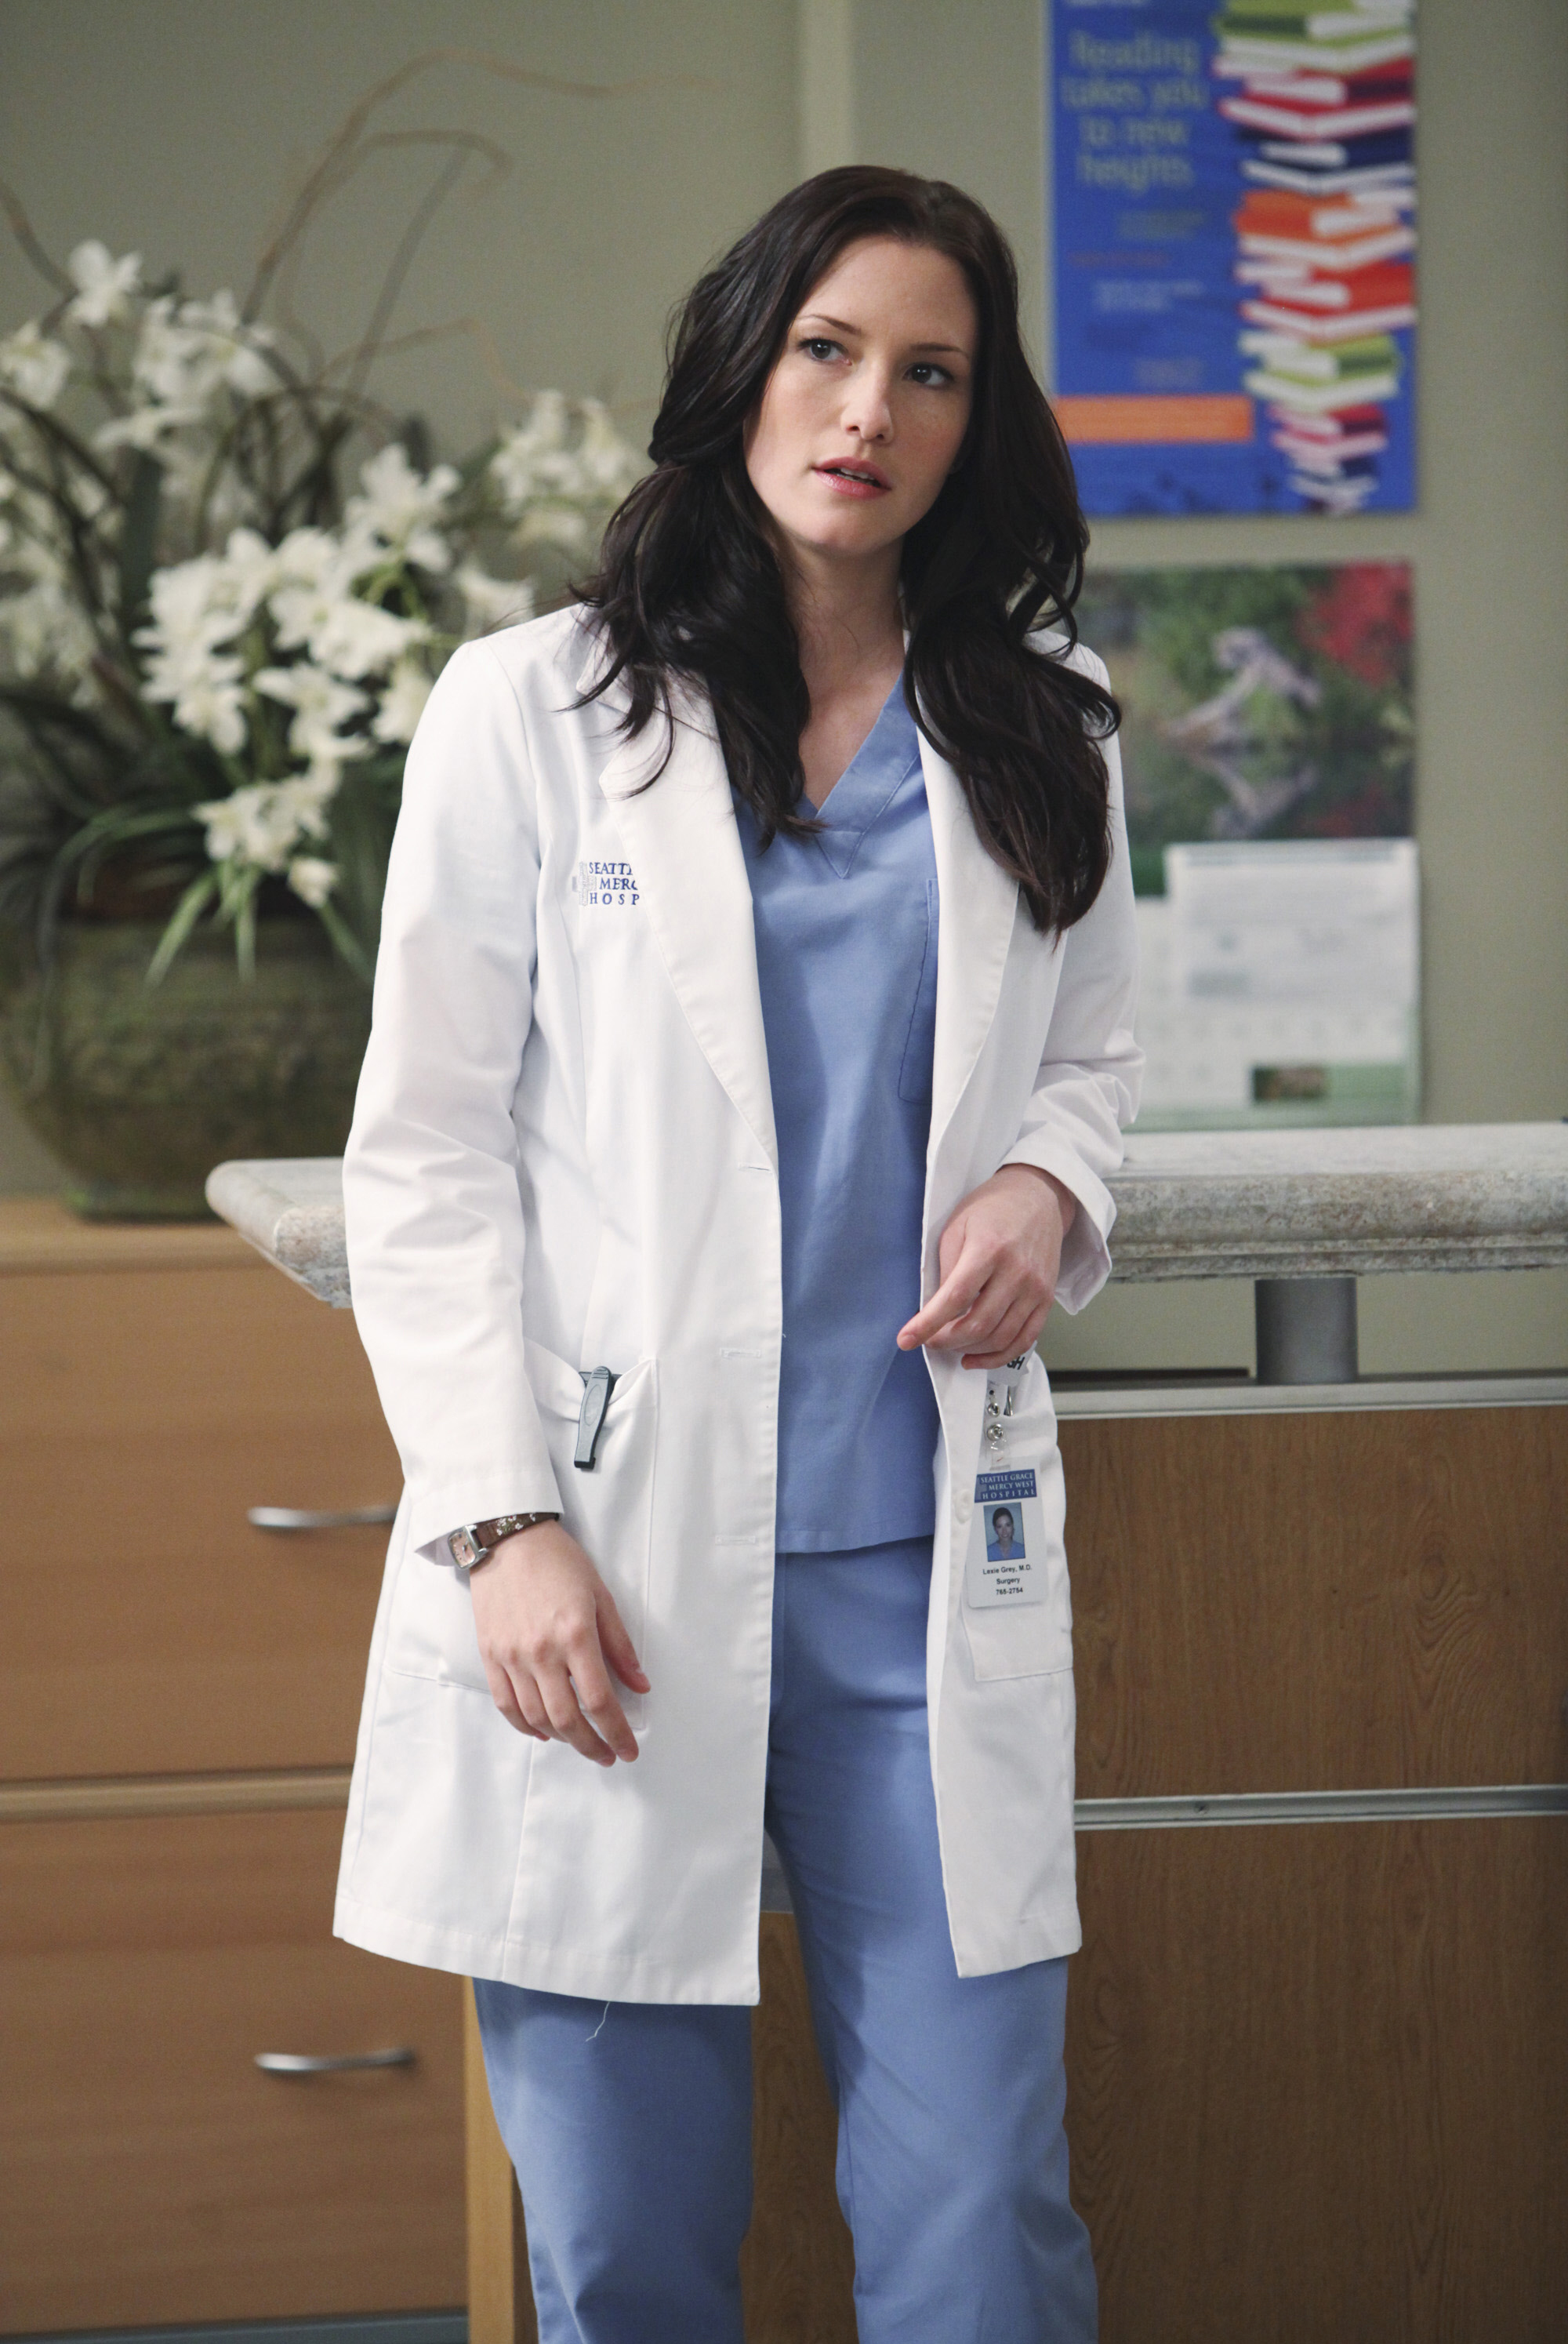 No. 15: Dr. Lexie Grey